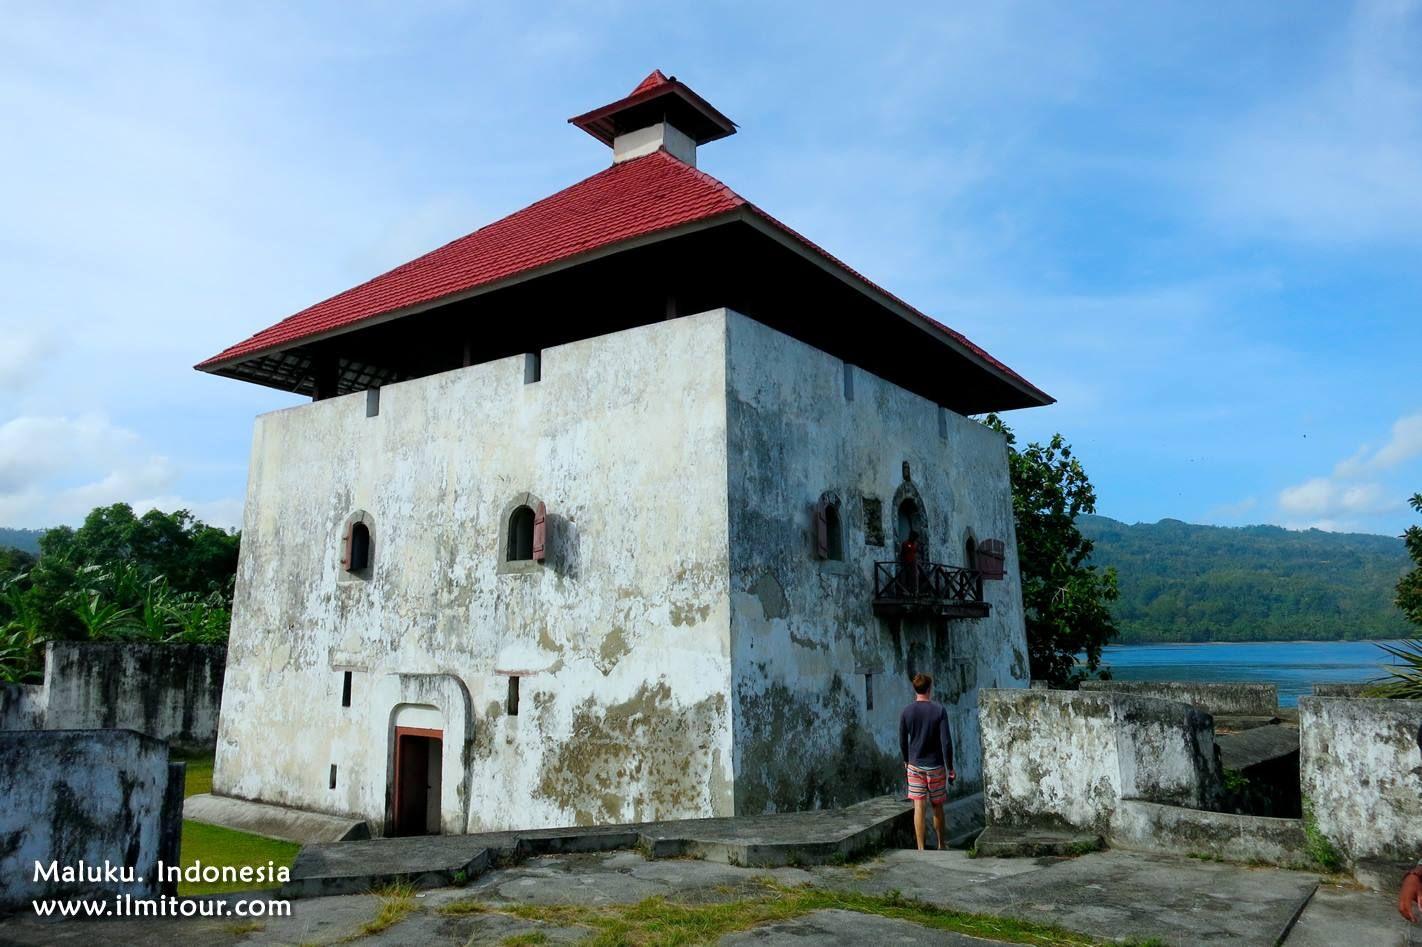 Benteng Amsterdam Negeri Hila Kecamatan Leihitu Maluku Tengah Pantai Wasisil